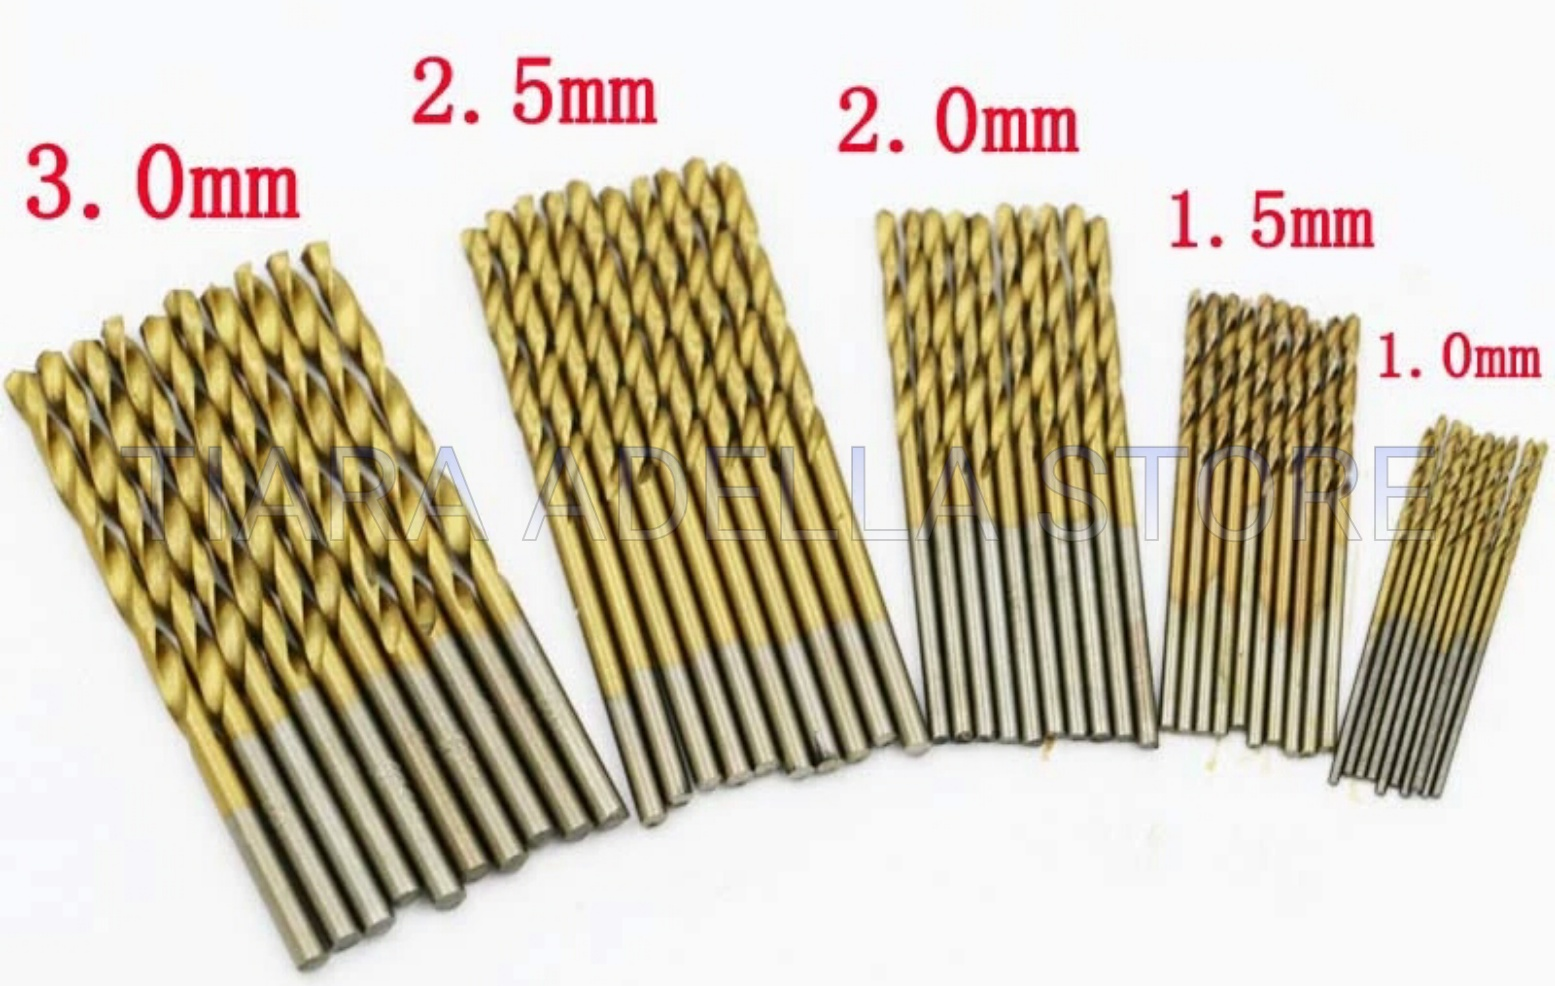 MATABOR BESI 2.5mm Gold